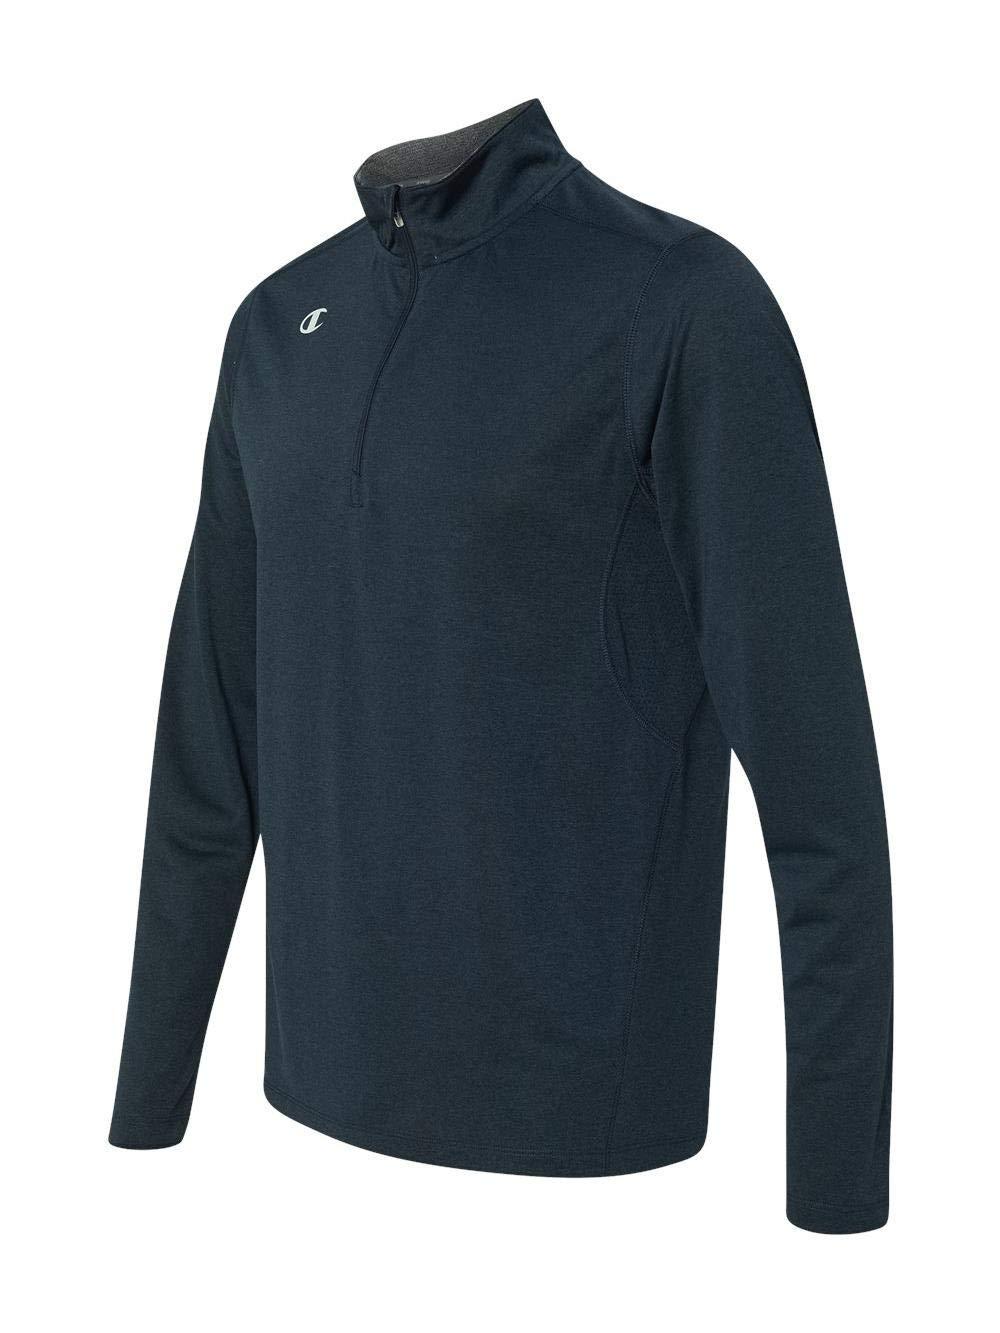 Champion Men's Quarter-Zip Double Dry Pullover, Navy Heather, Medium by Champion